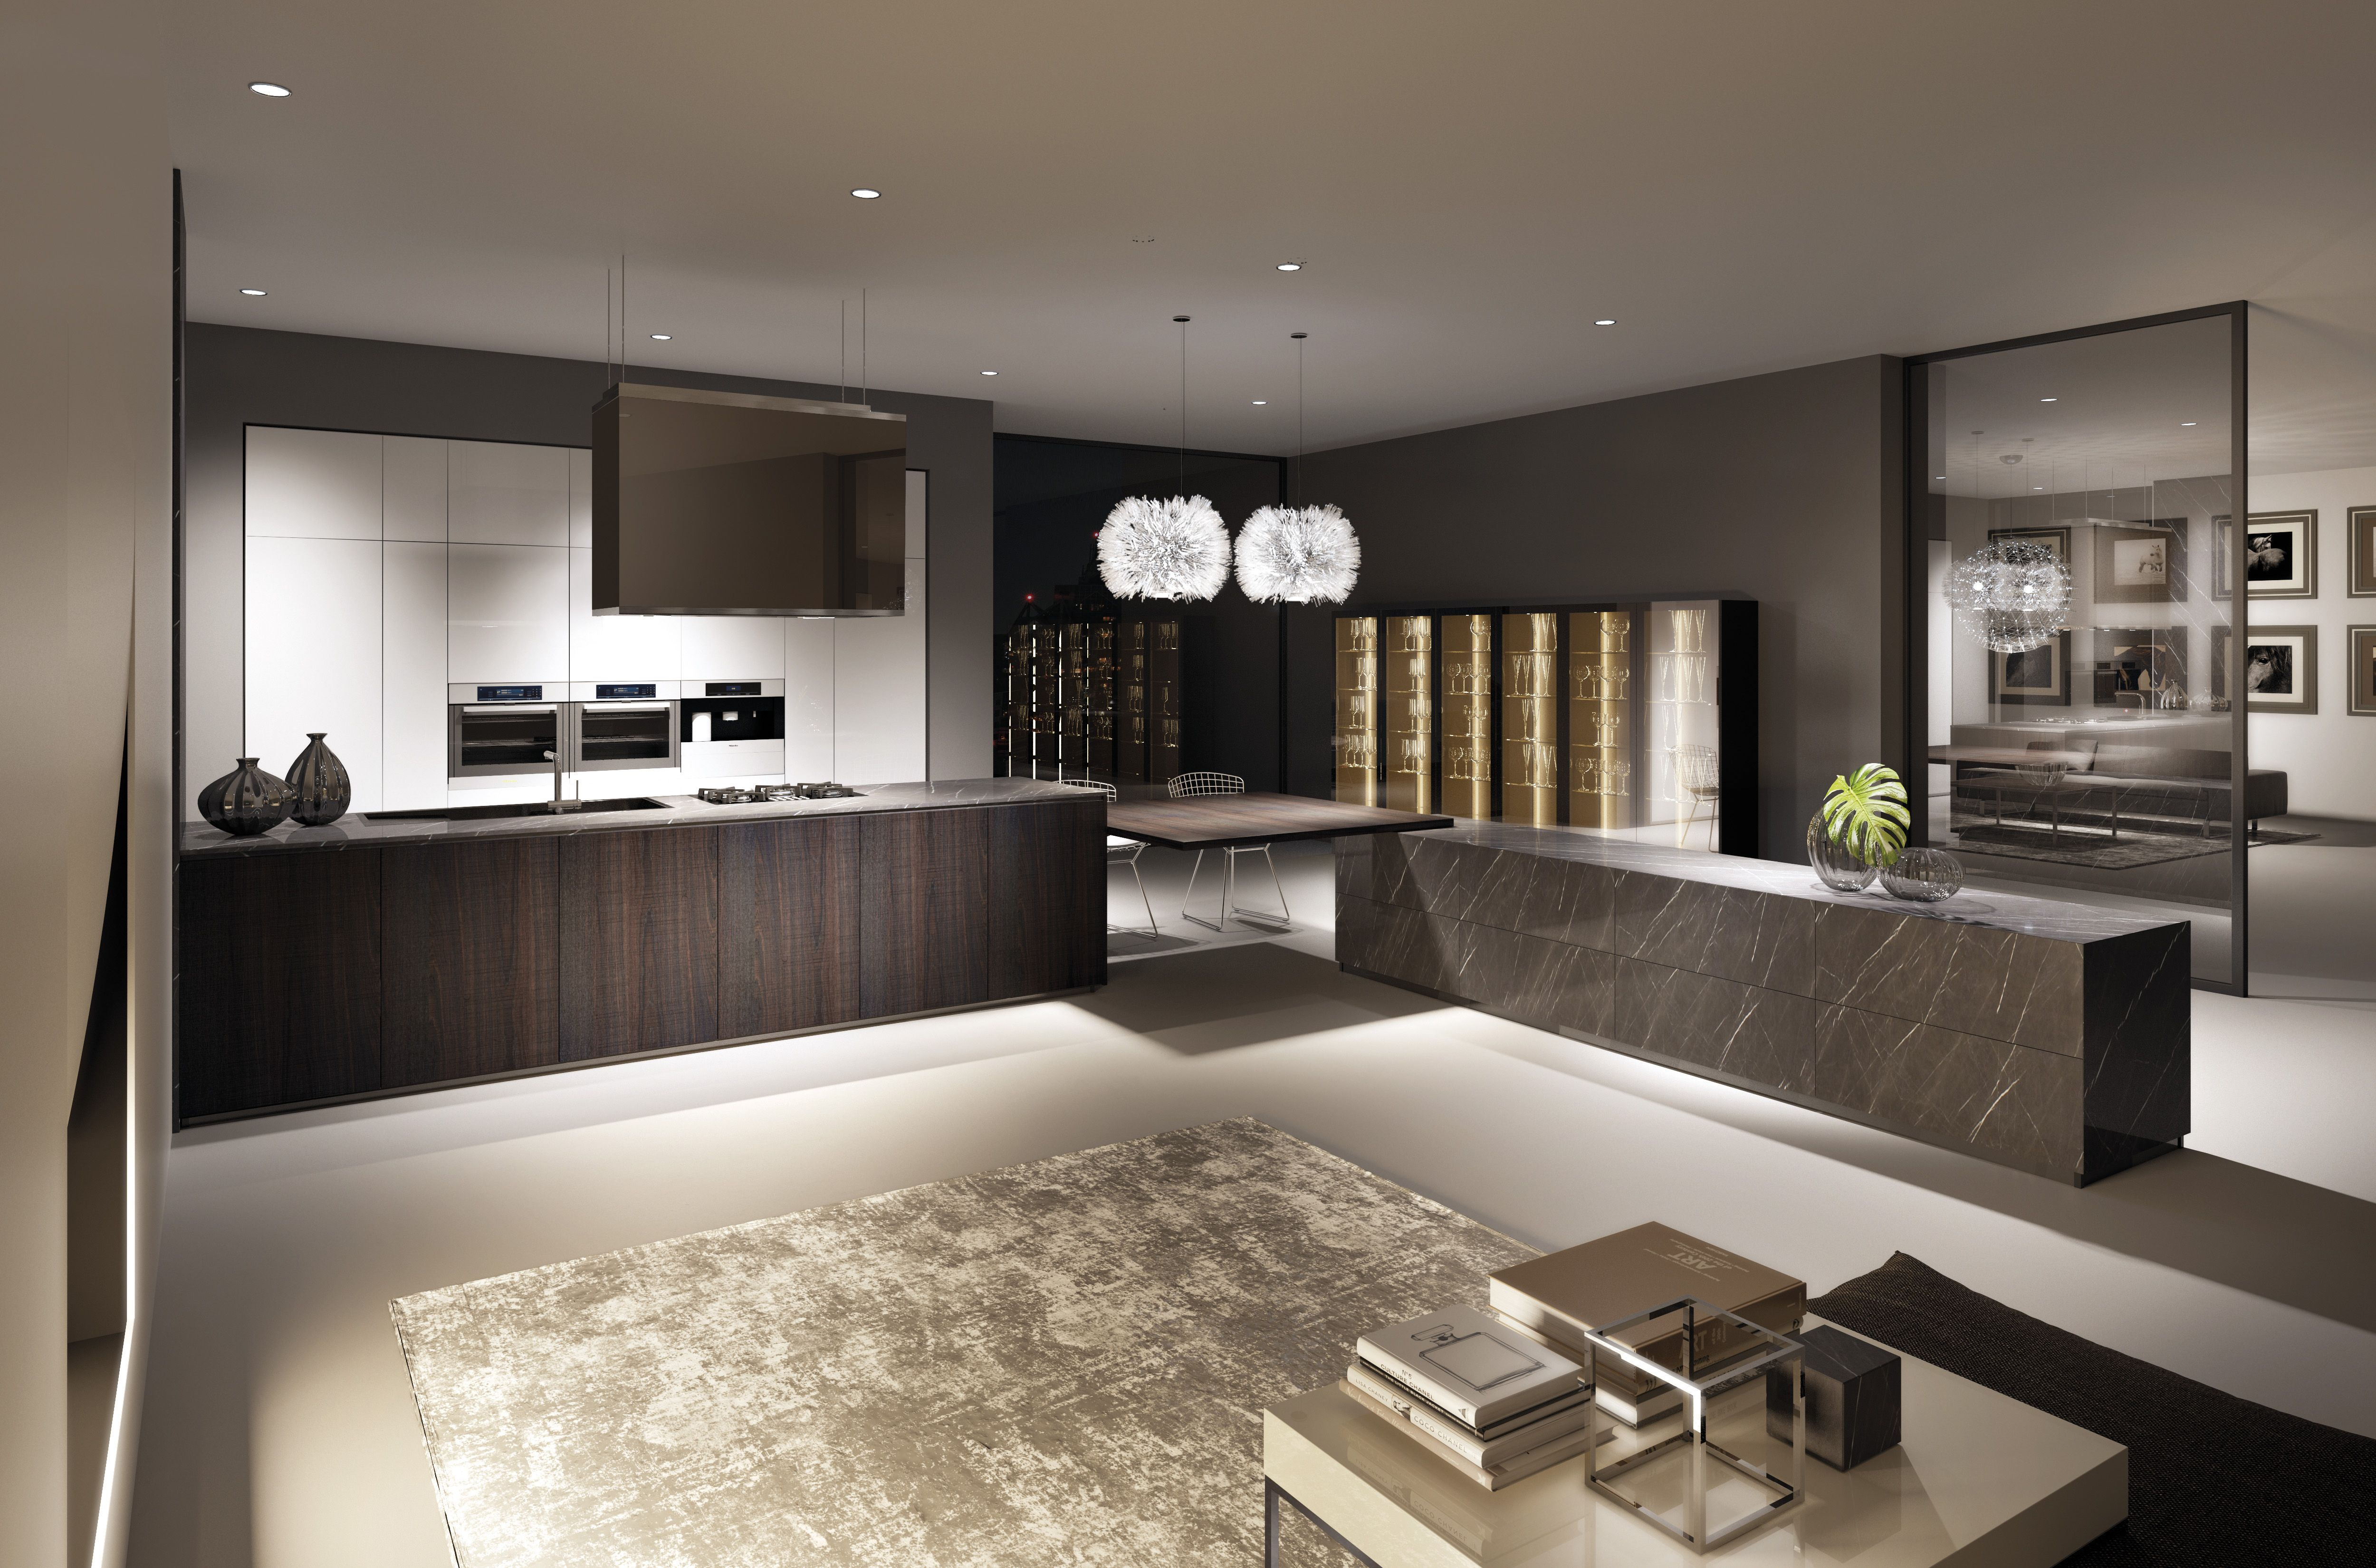 Idee Per La Cucina wooden tortona oak kitchen doors combined with glossy white